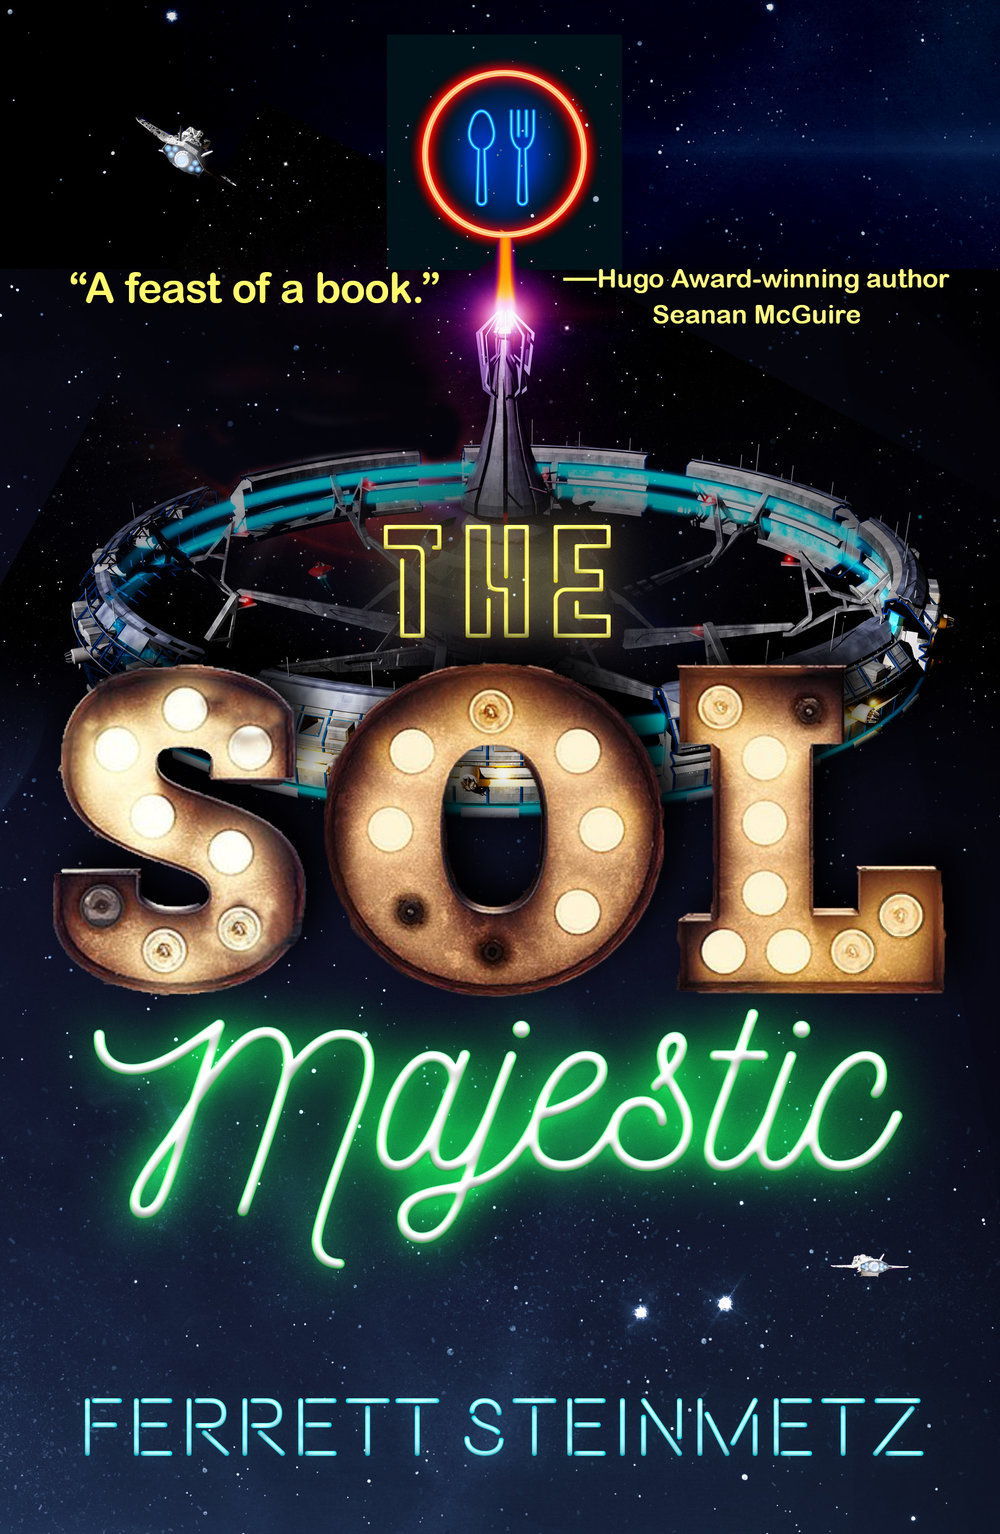 The Sol Majestic_Ferrett Steinmetz.jpg